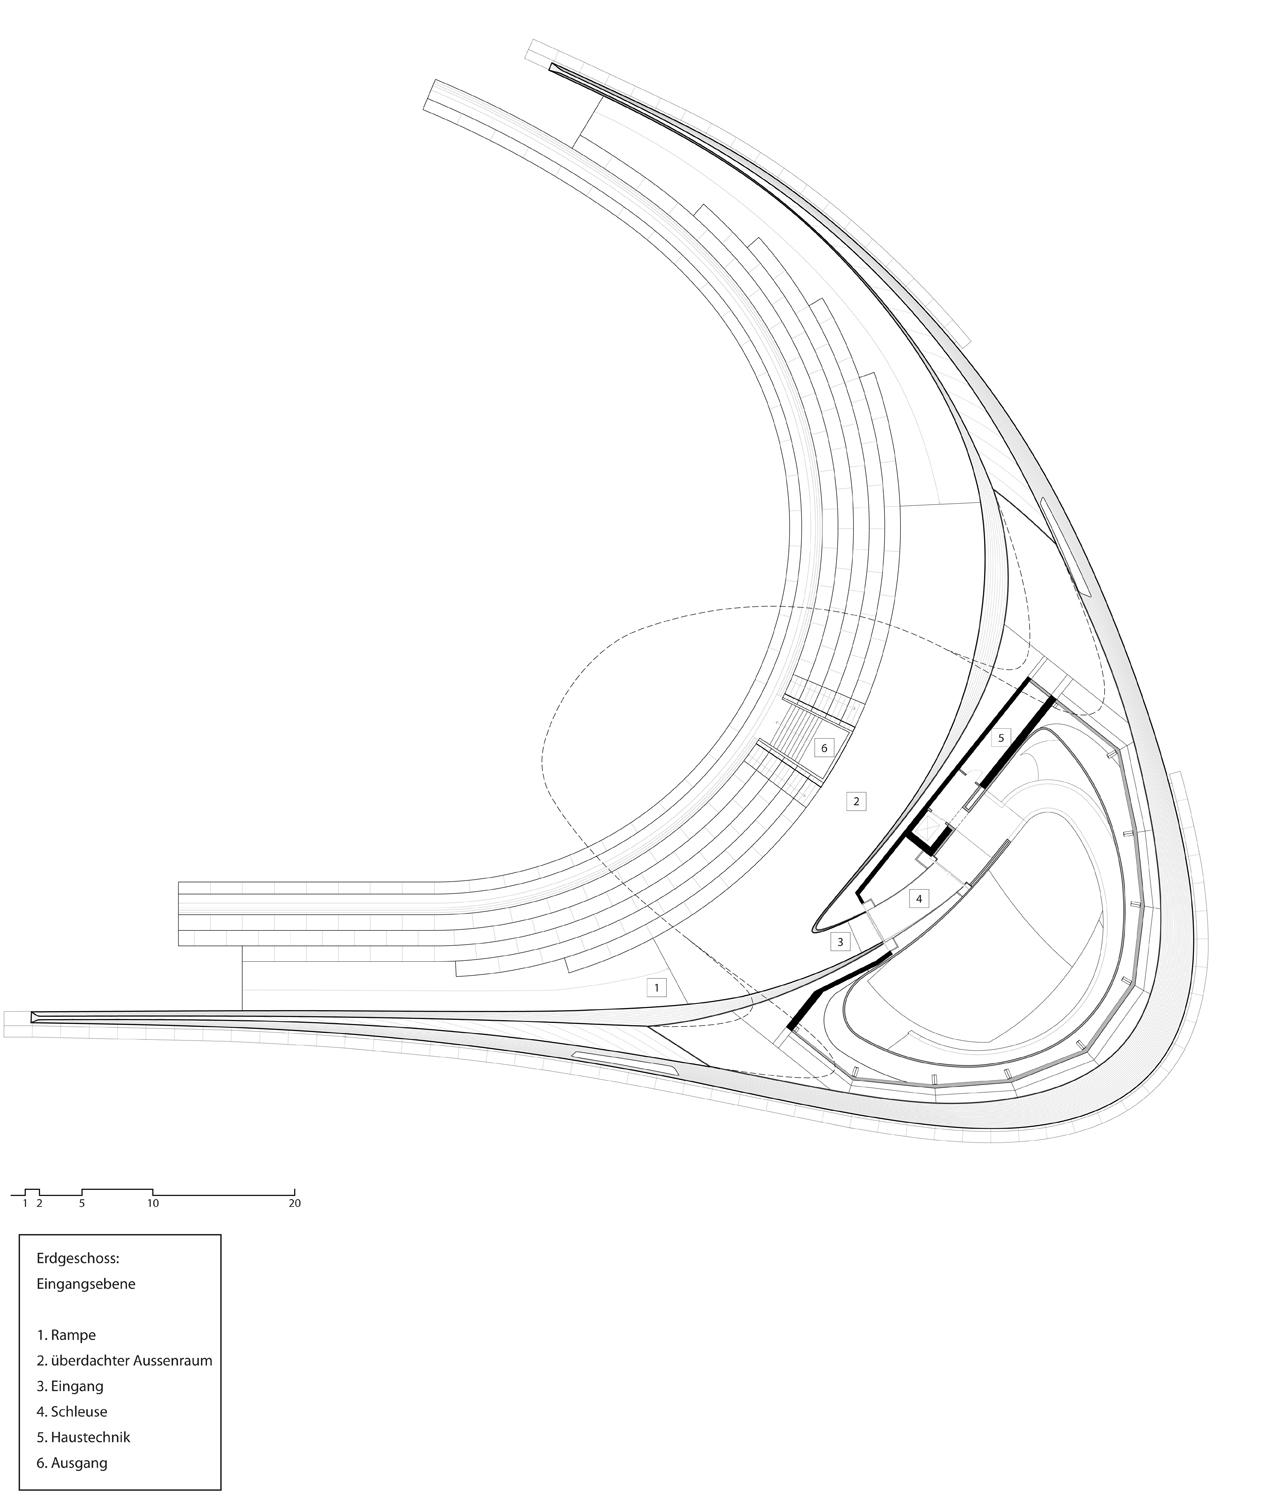 Galeria De Pavilh 227 O Porsche Na Autostadt Em Wolfsburg